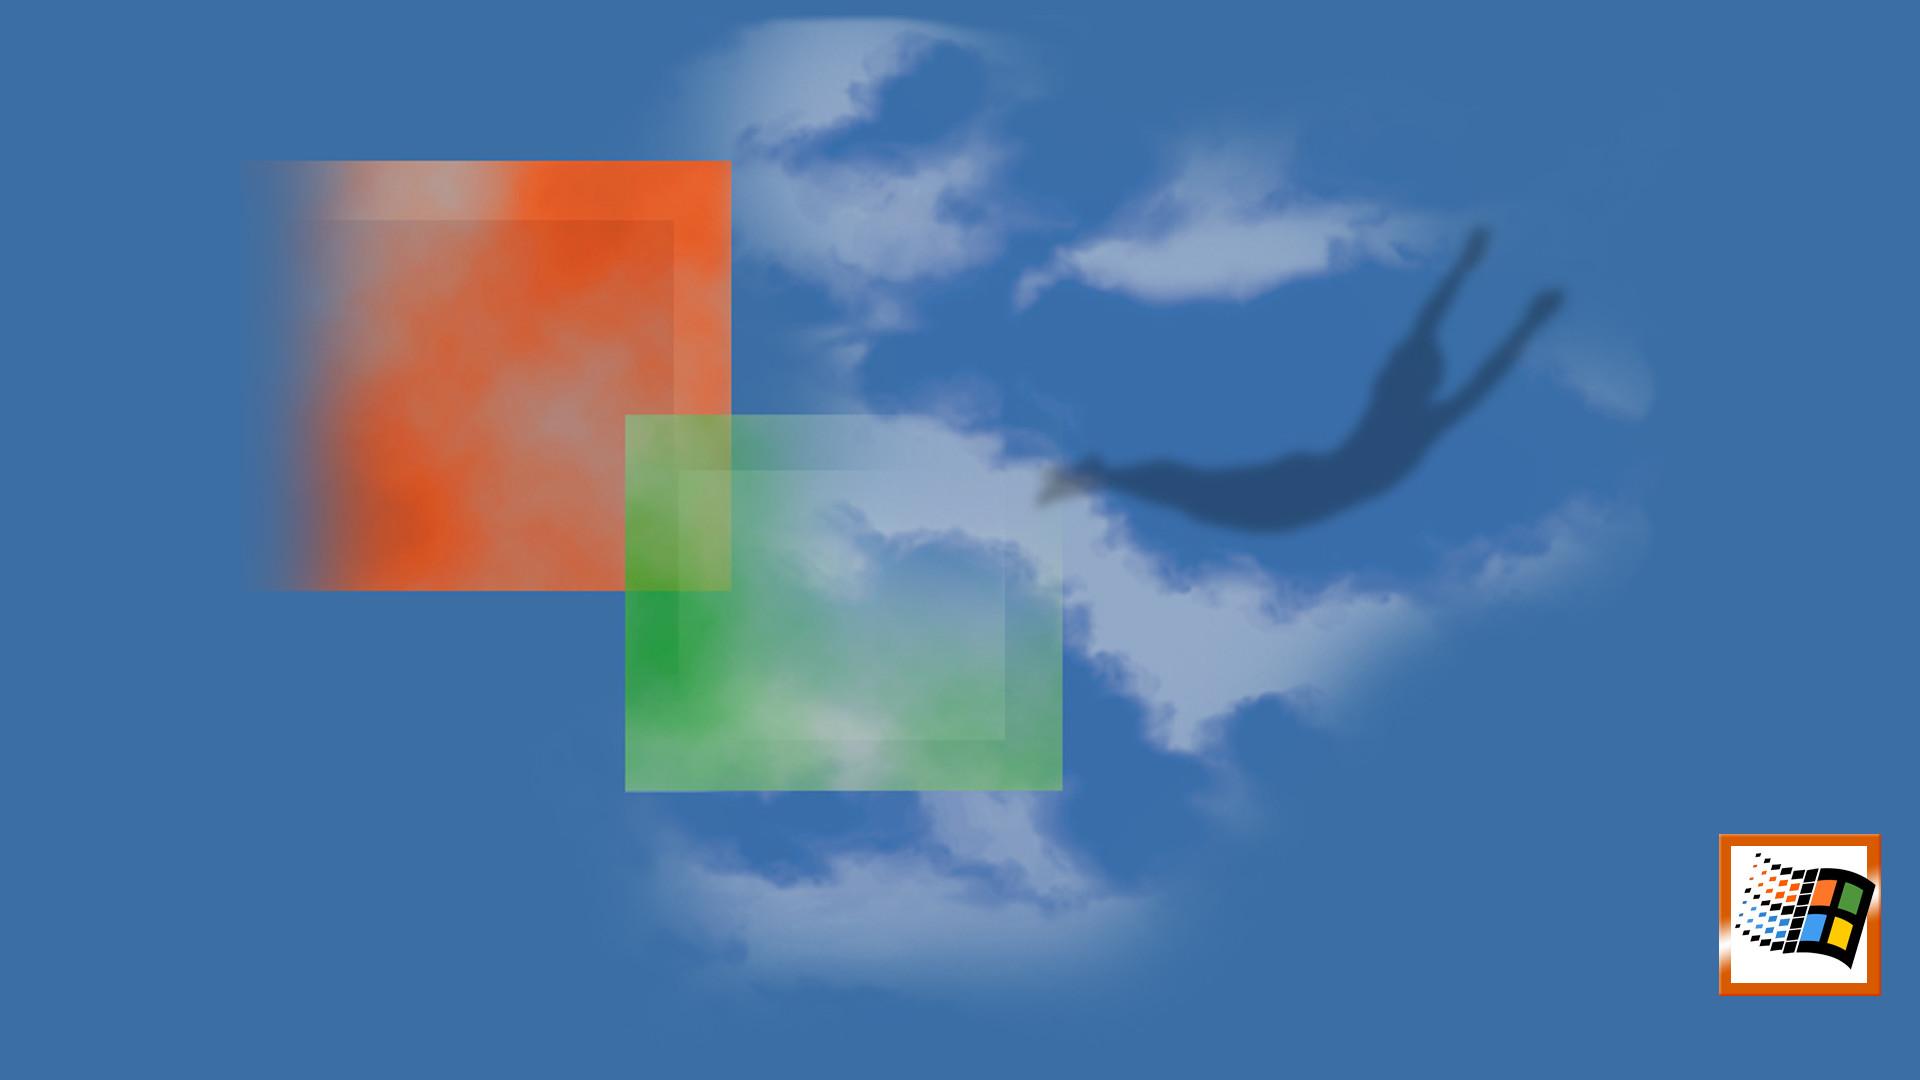 Windows 95 Wallpaper Pack (54+ images)